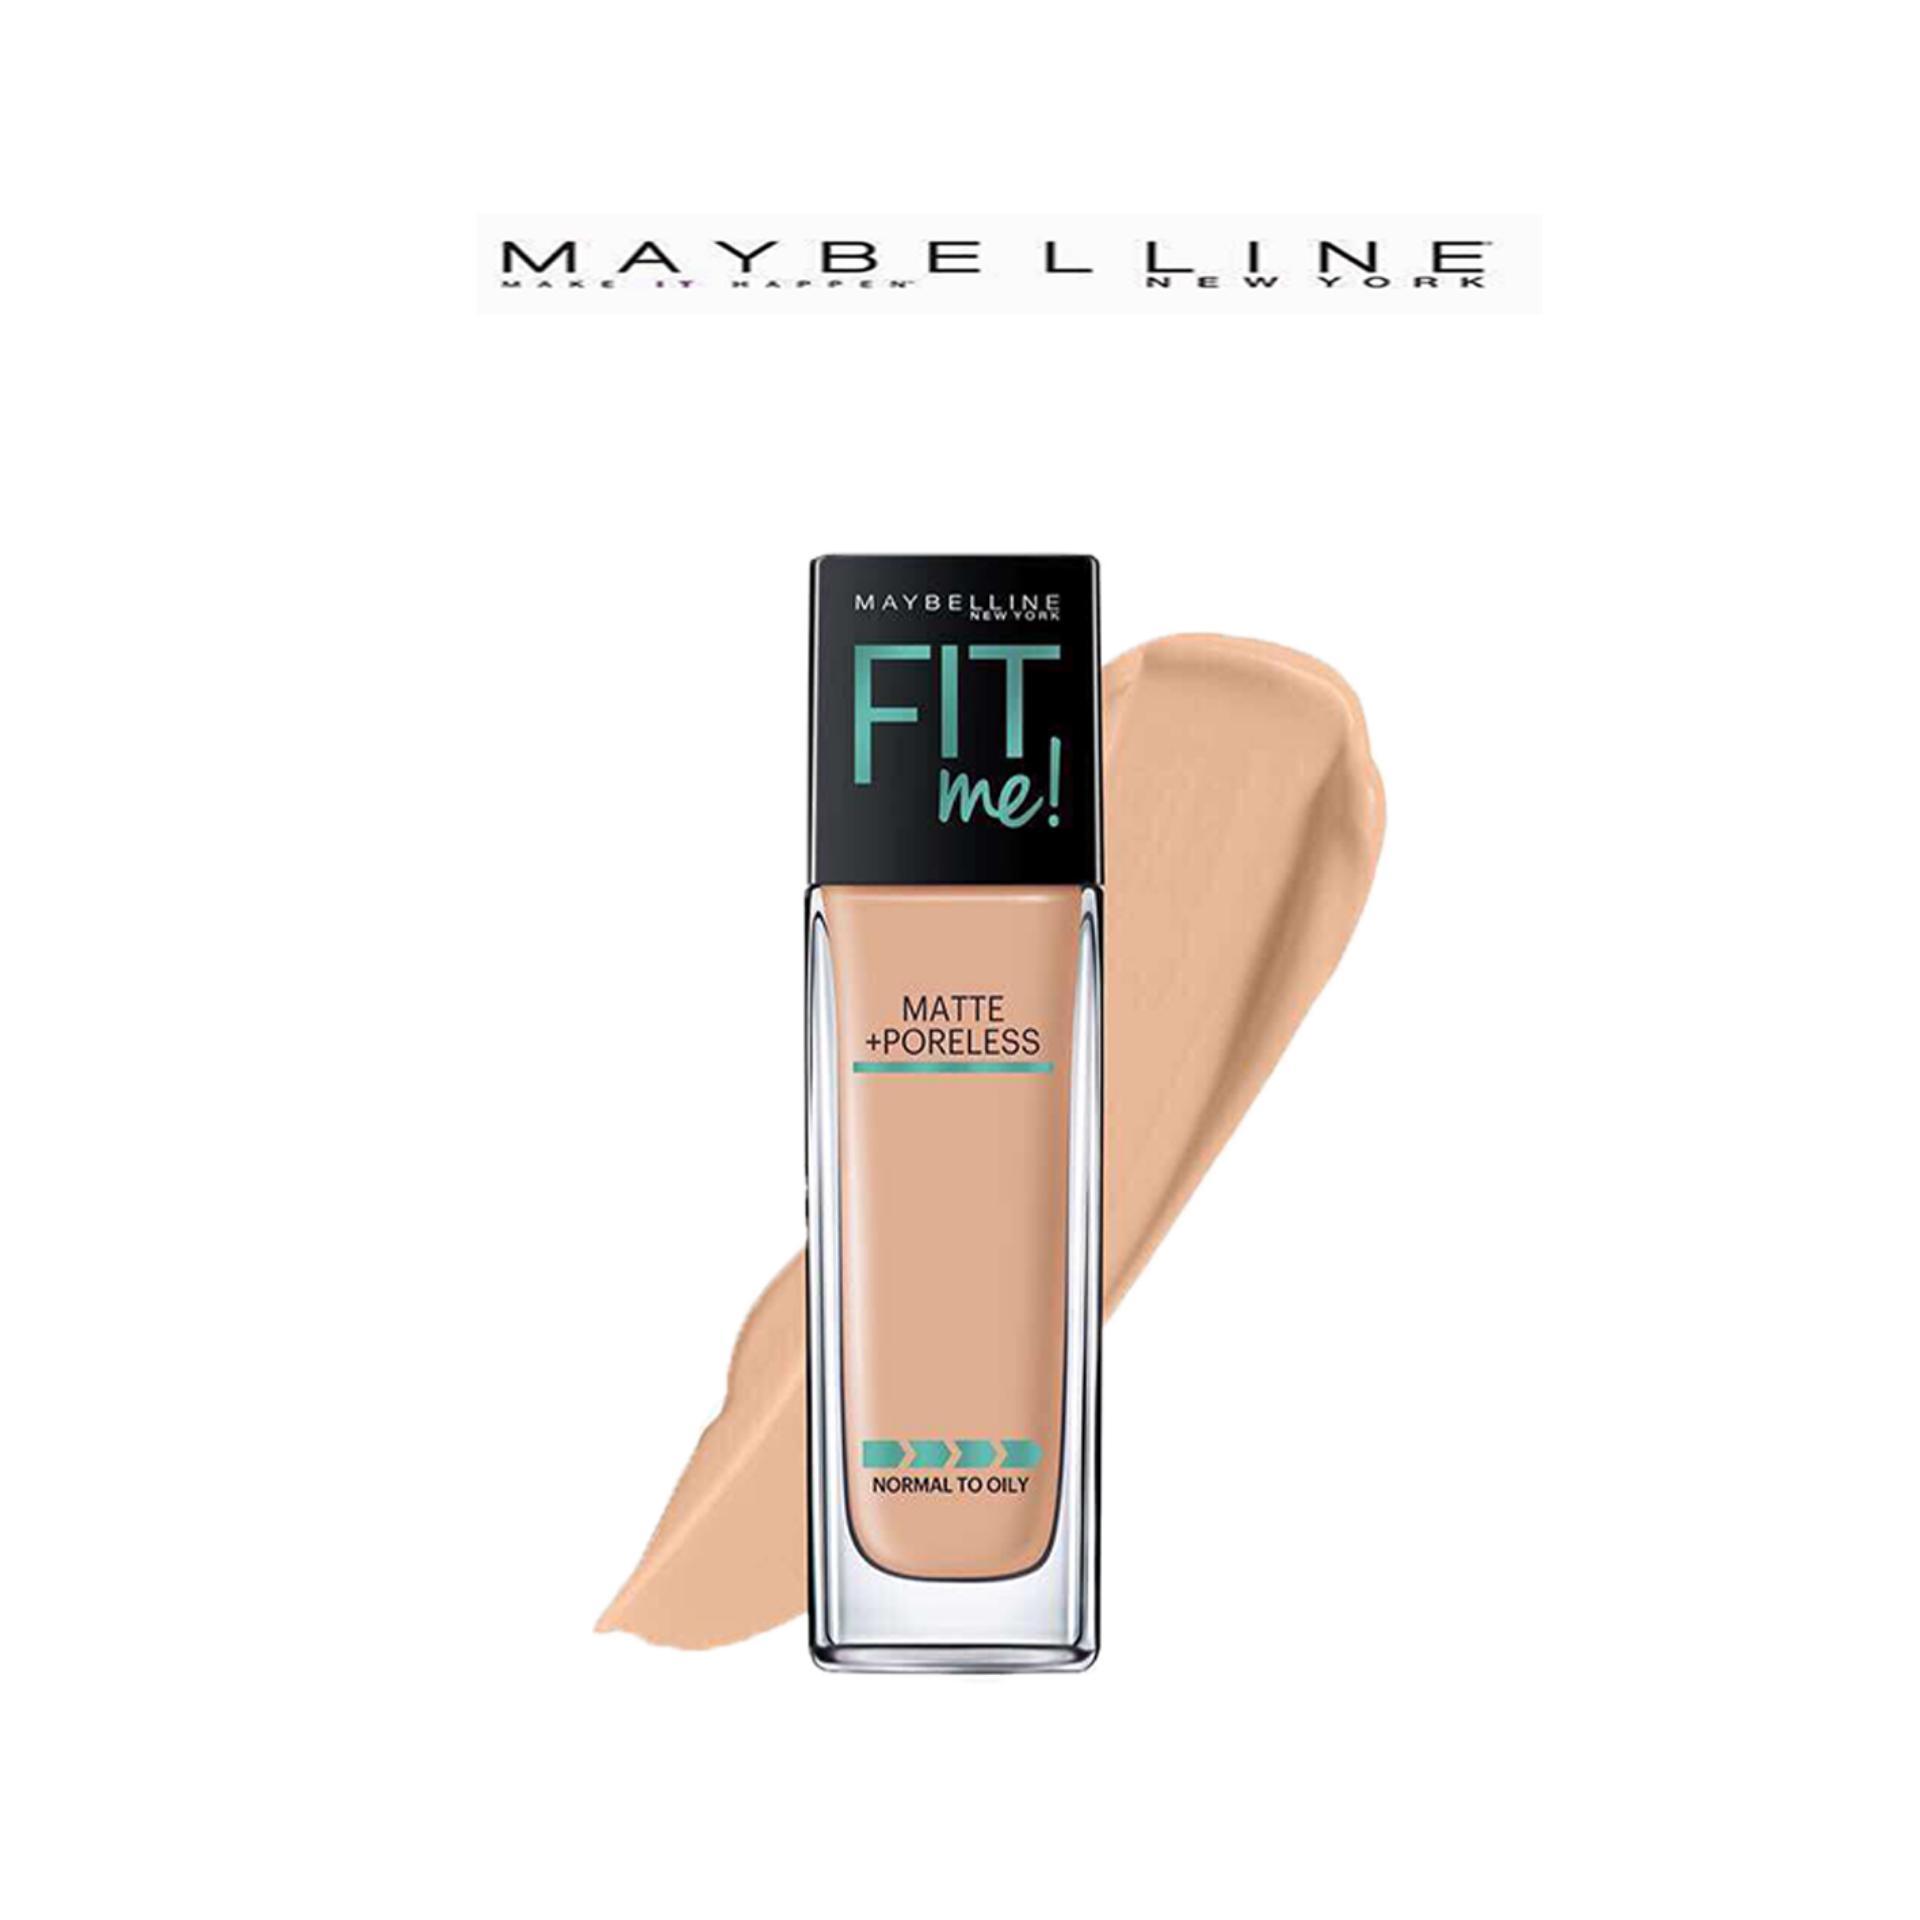 Fit Me Matte + Poreless Liquid Foundation 30 Ml By Sex Toys Adizai.